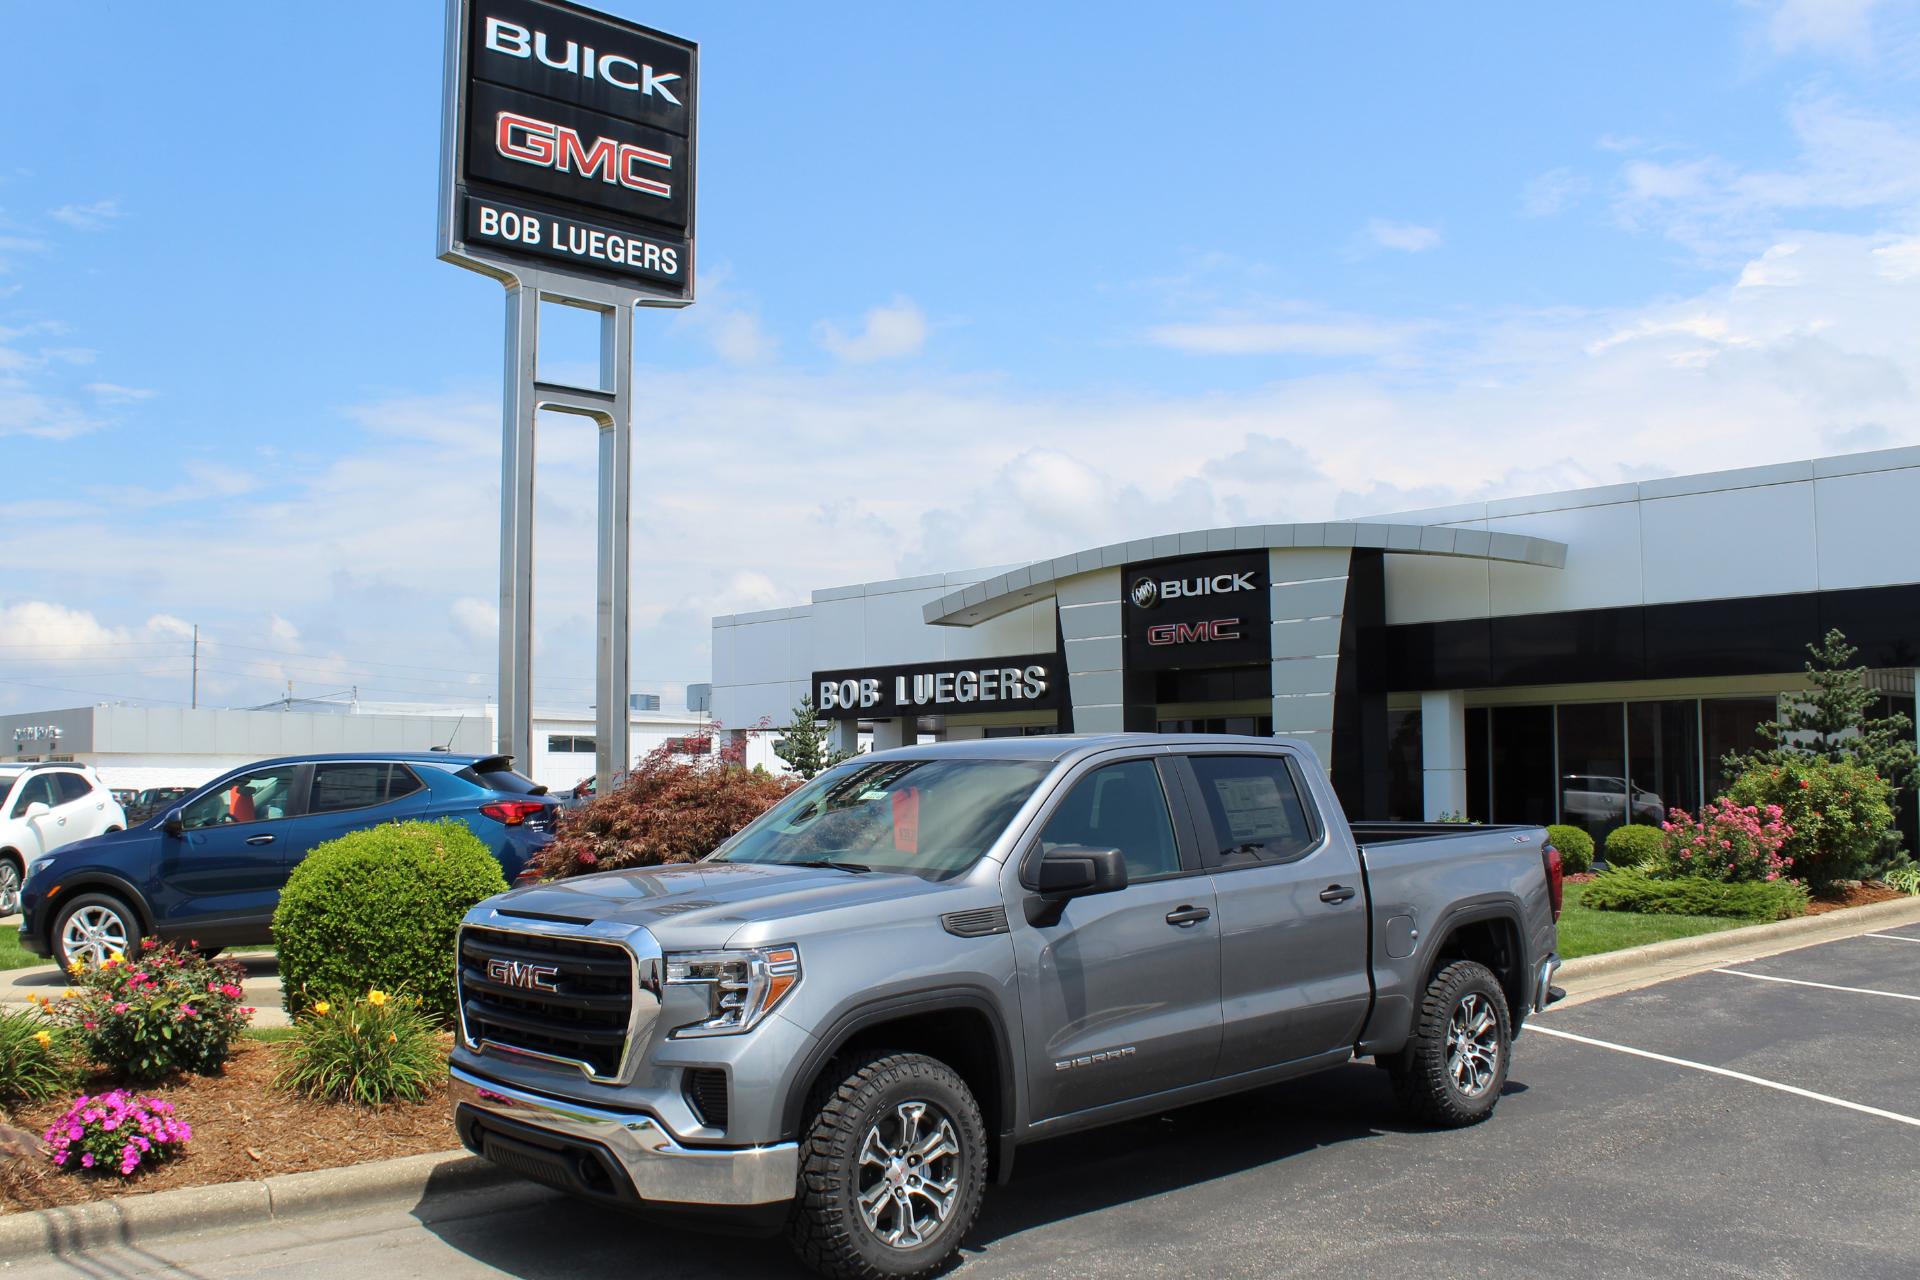 Buick GMC Sign